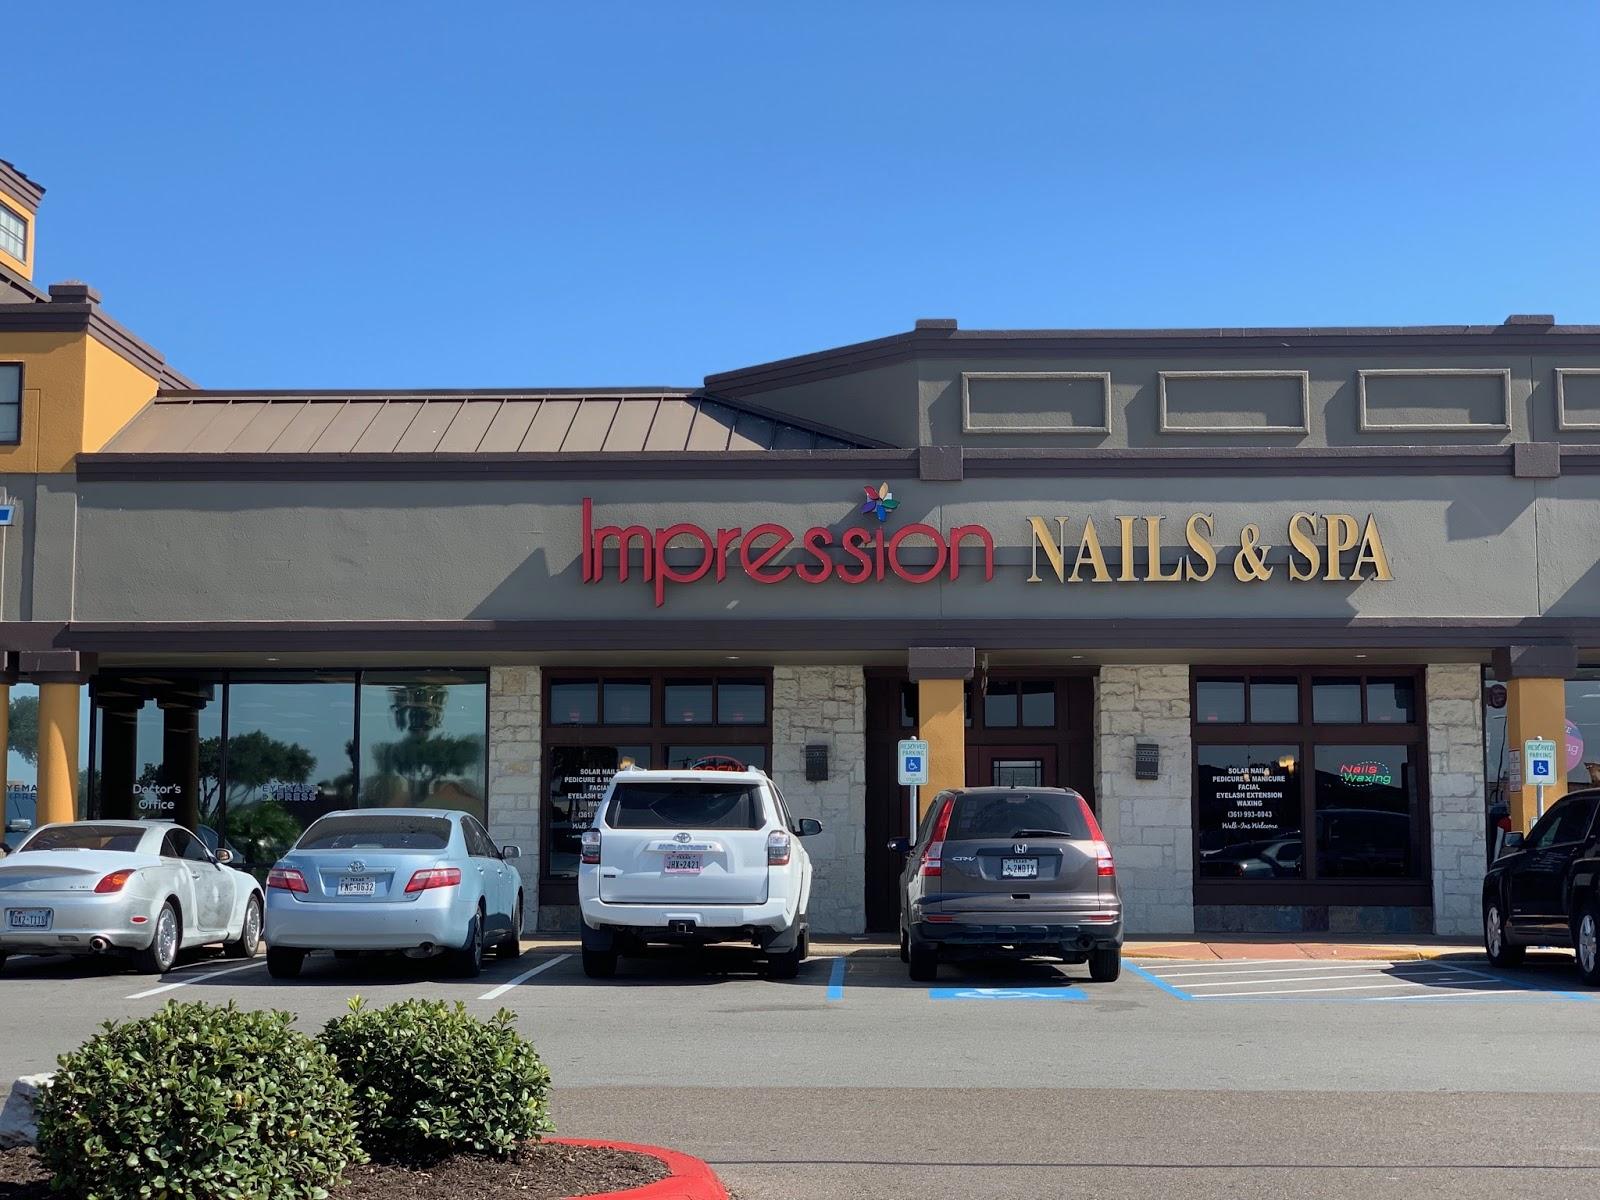 Nail Salon 78411 - Impression Nails & Spa - Nail Salon in South Side Corpus Christi TX 78411